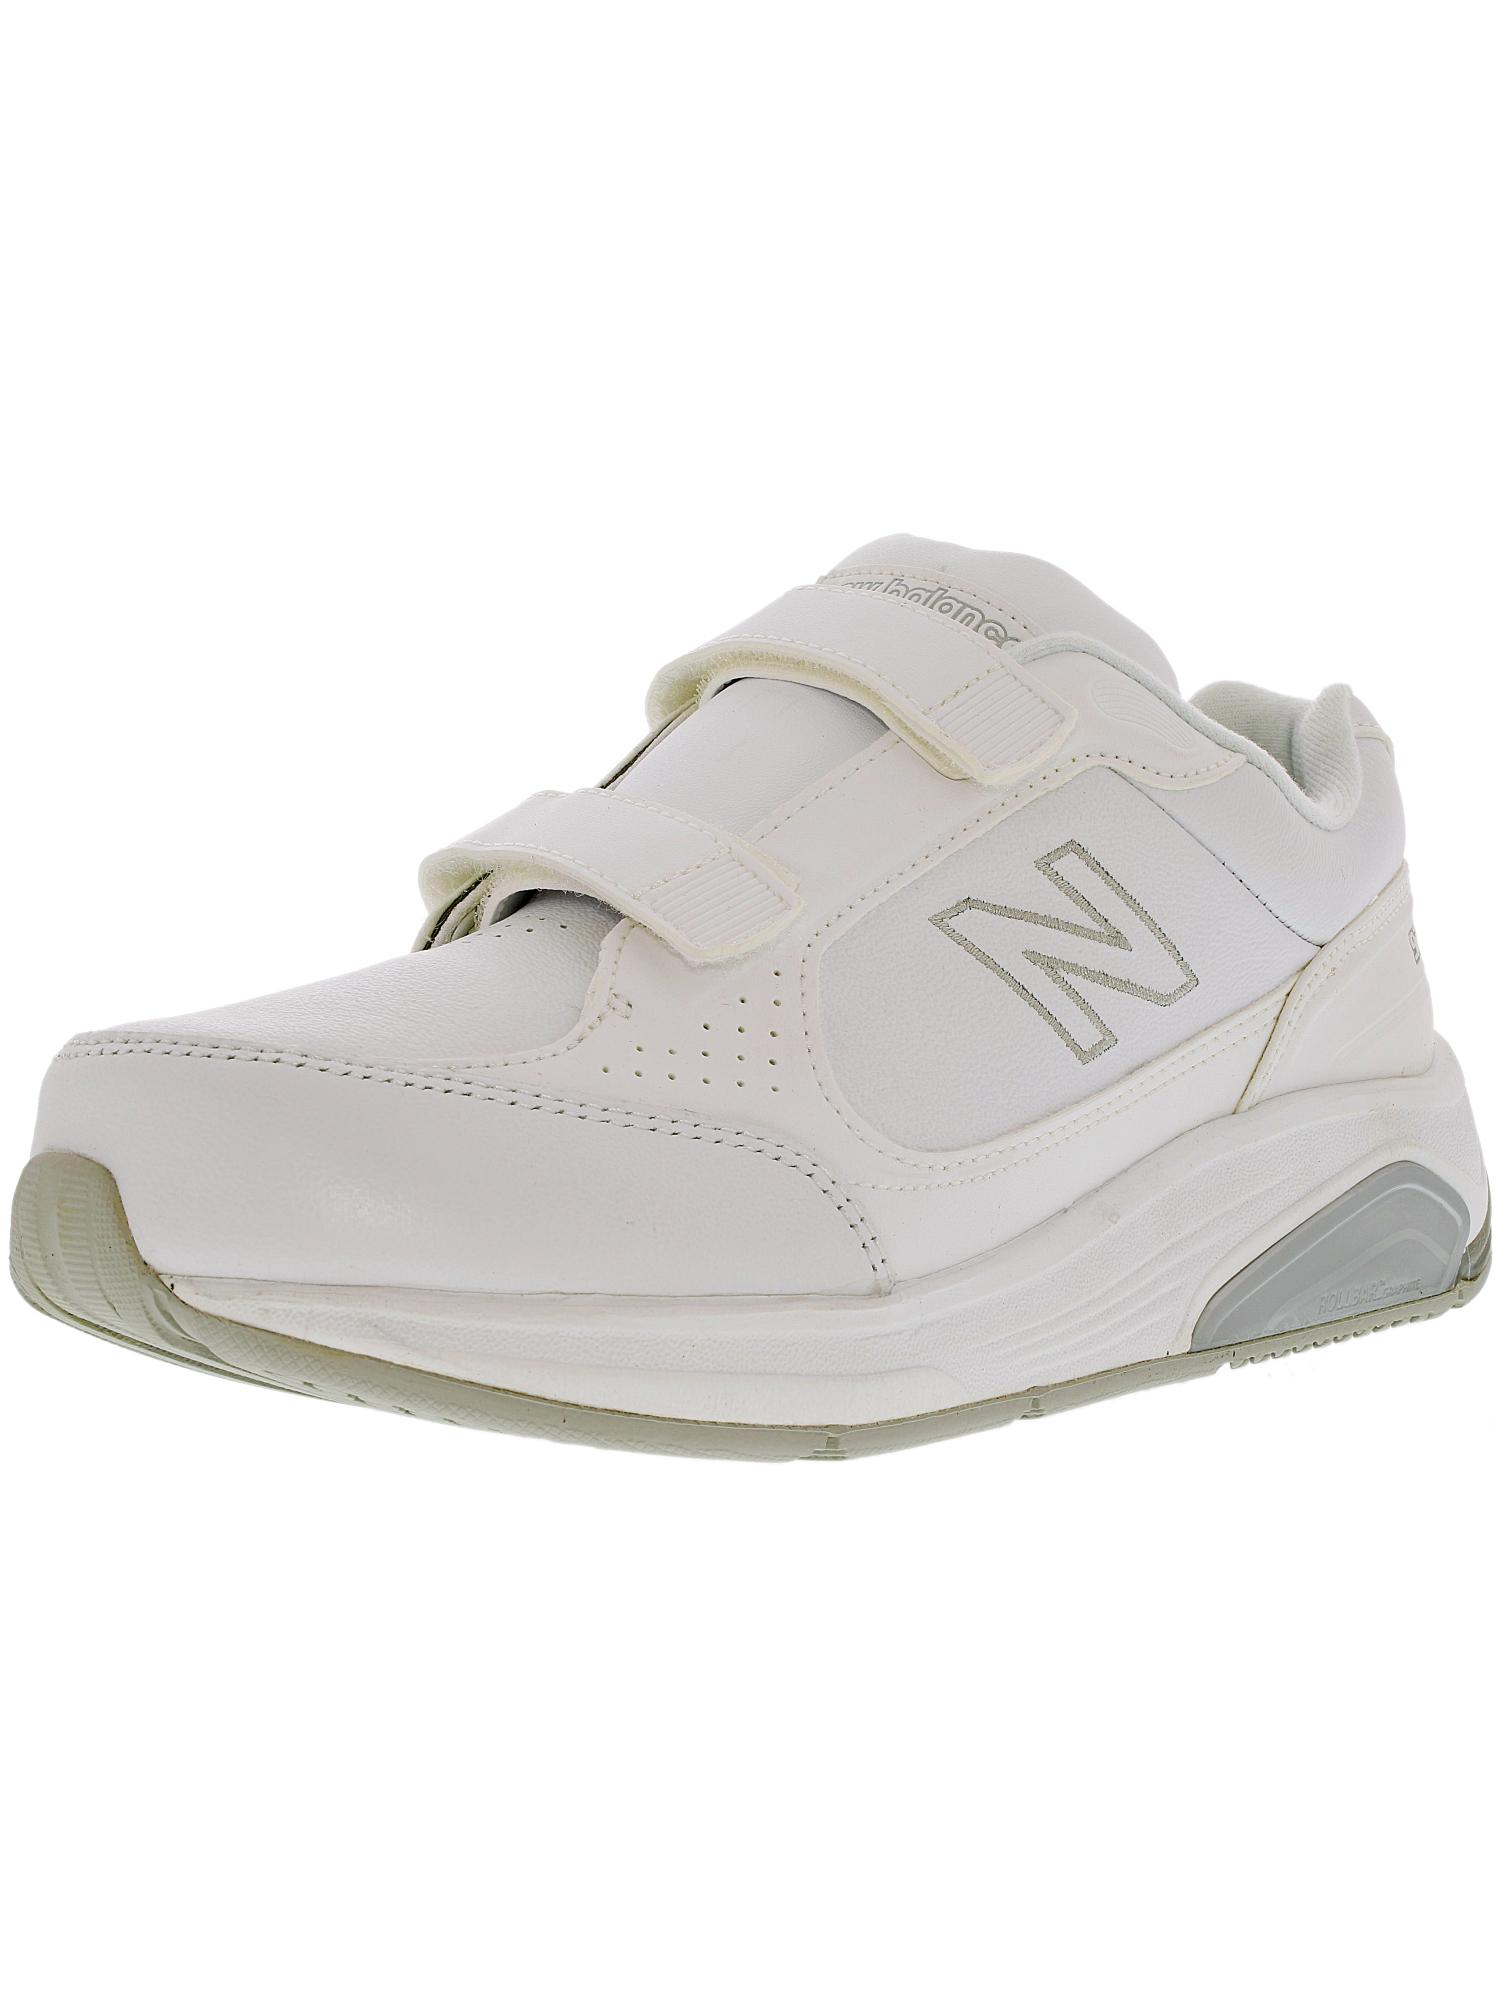 New Balance 2000 beige